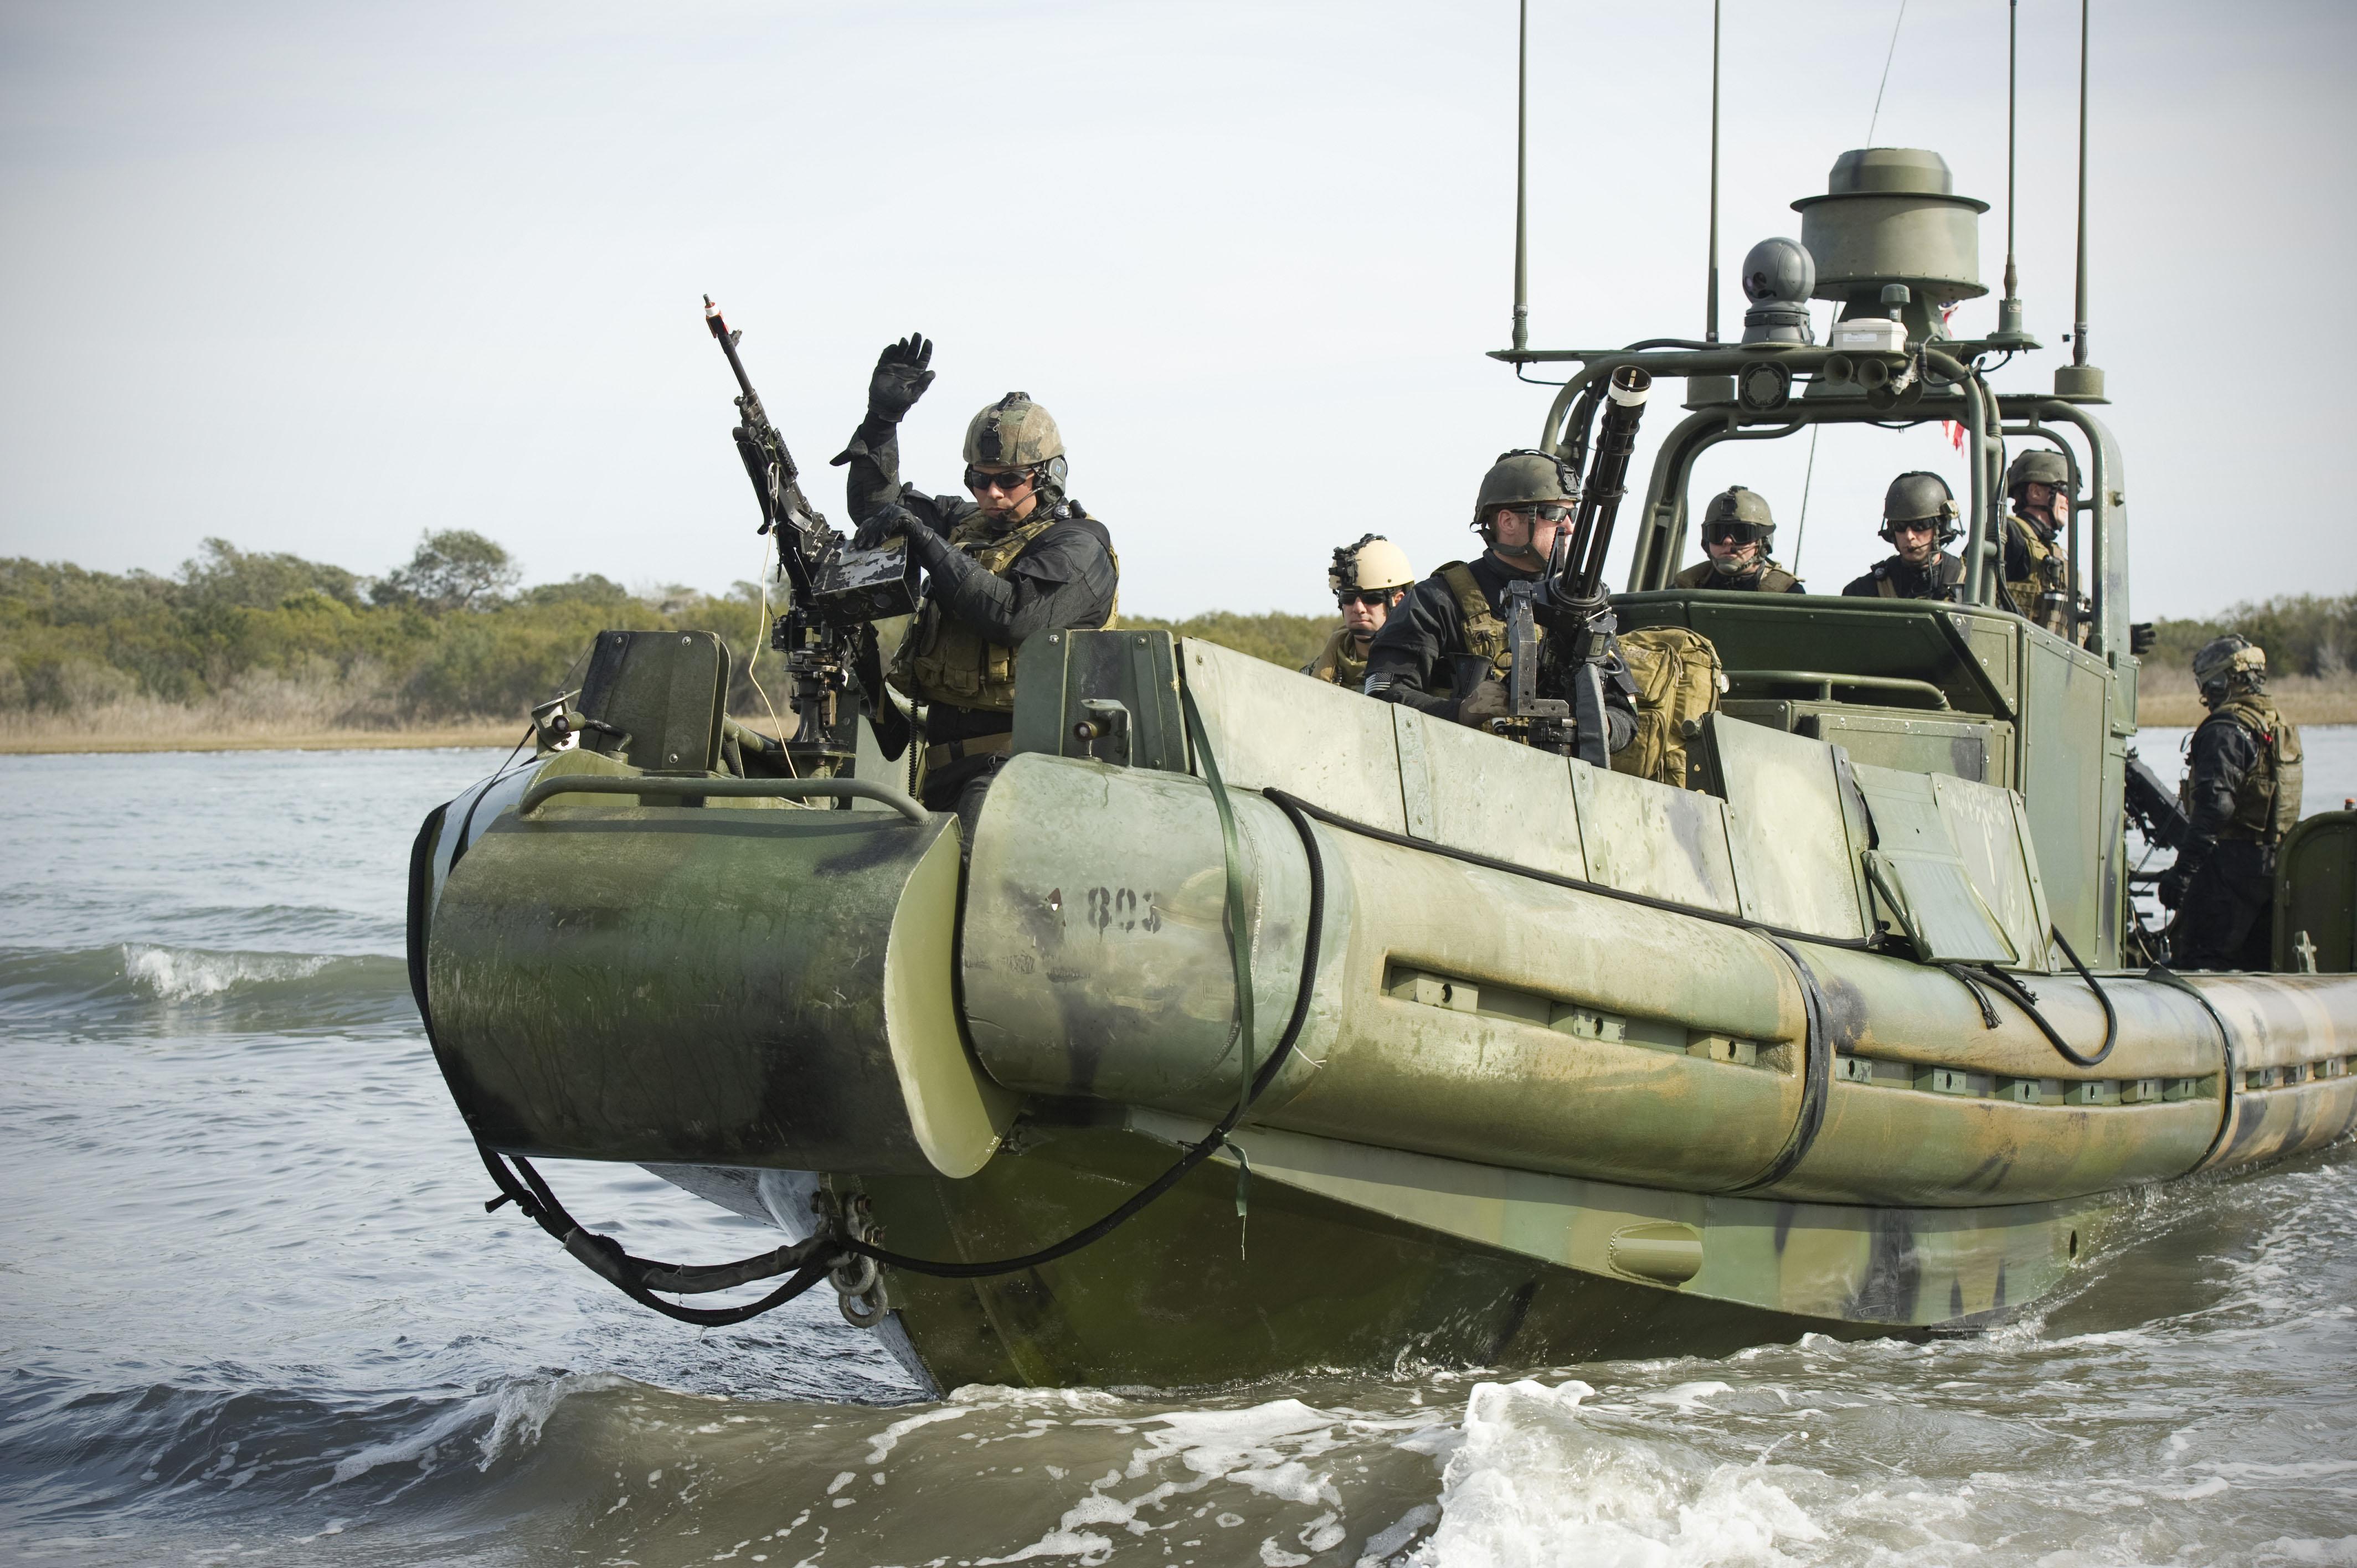 File:Defense.gov News Photo 120207-N-YX920-407 - U.S. Navy sailors ...